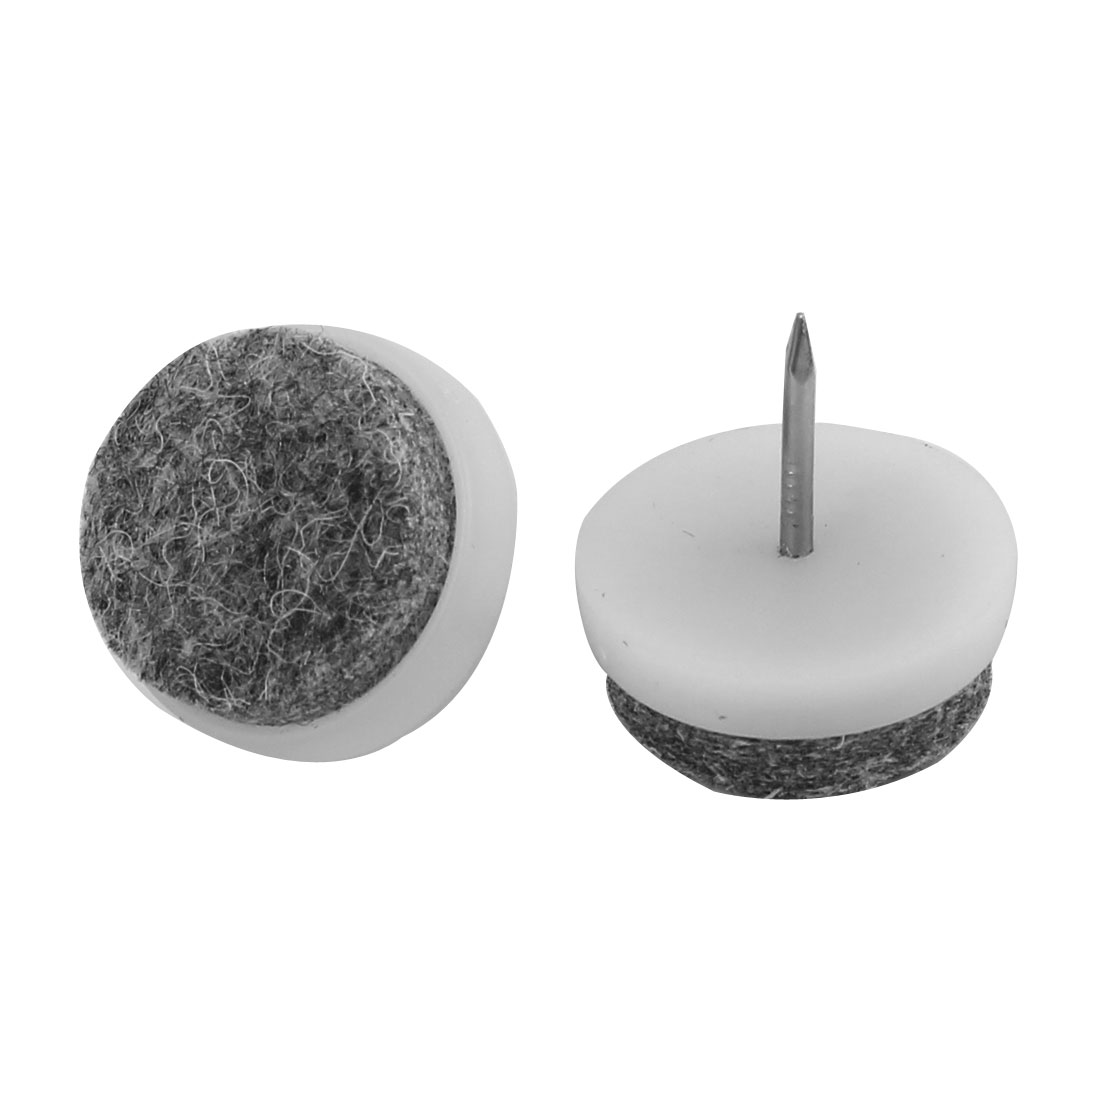 Furniture Table Couch Legs Nail On Pad Skid Felt Floor Protectors 22mm Dia 20pcs - image 1 de 2